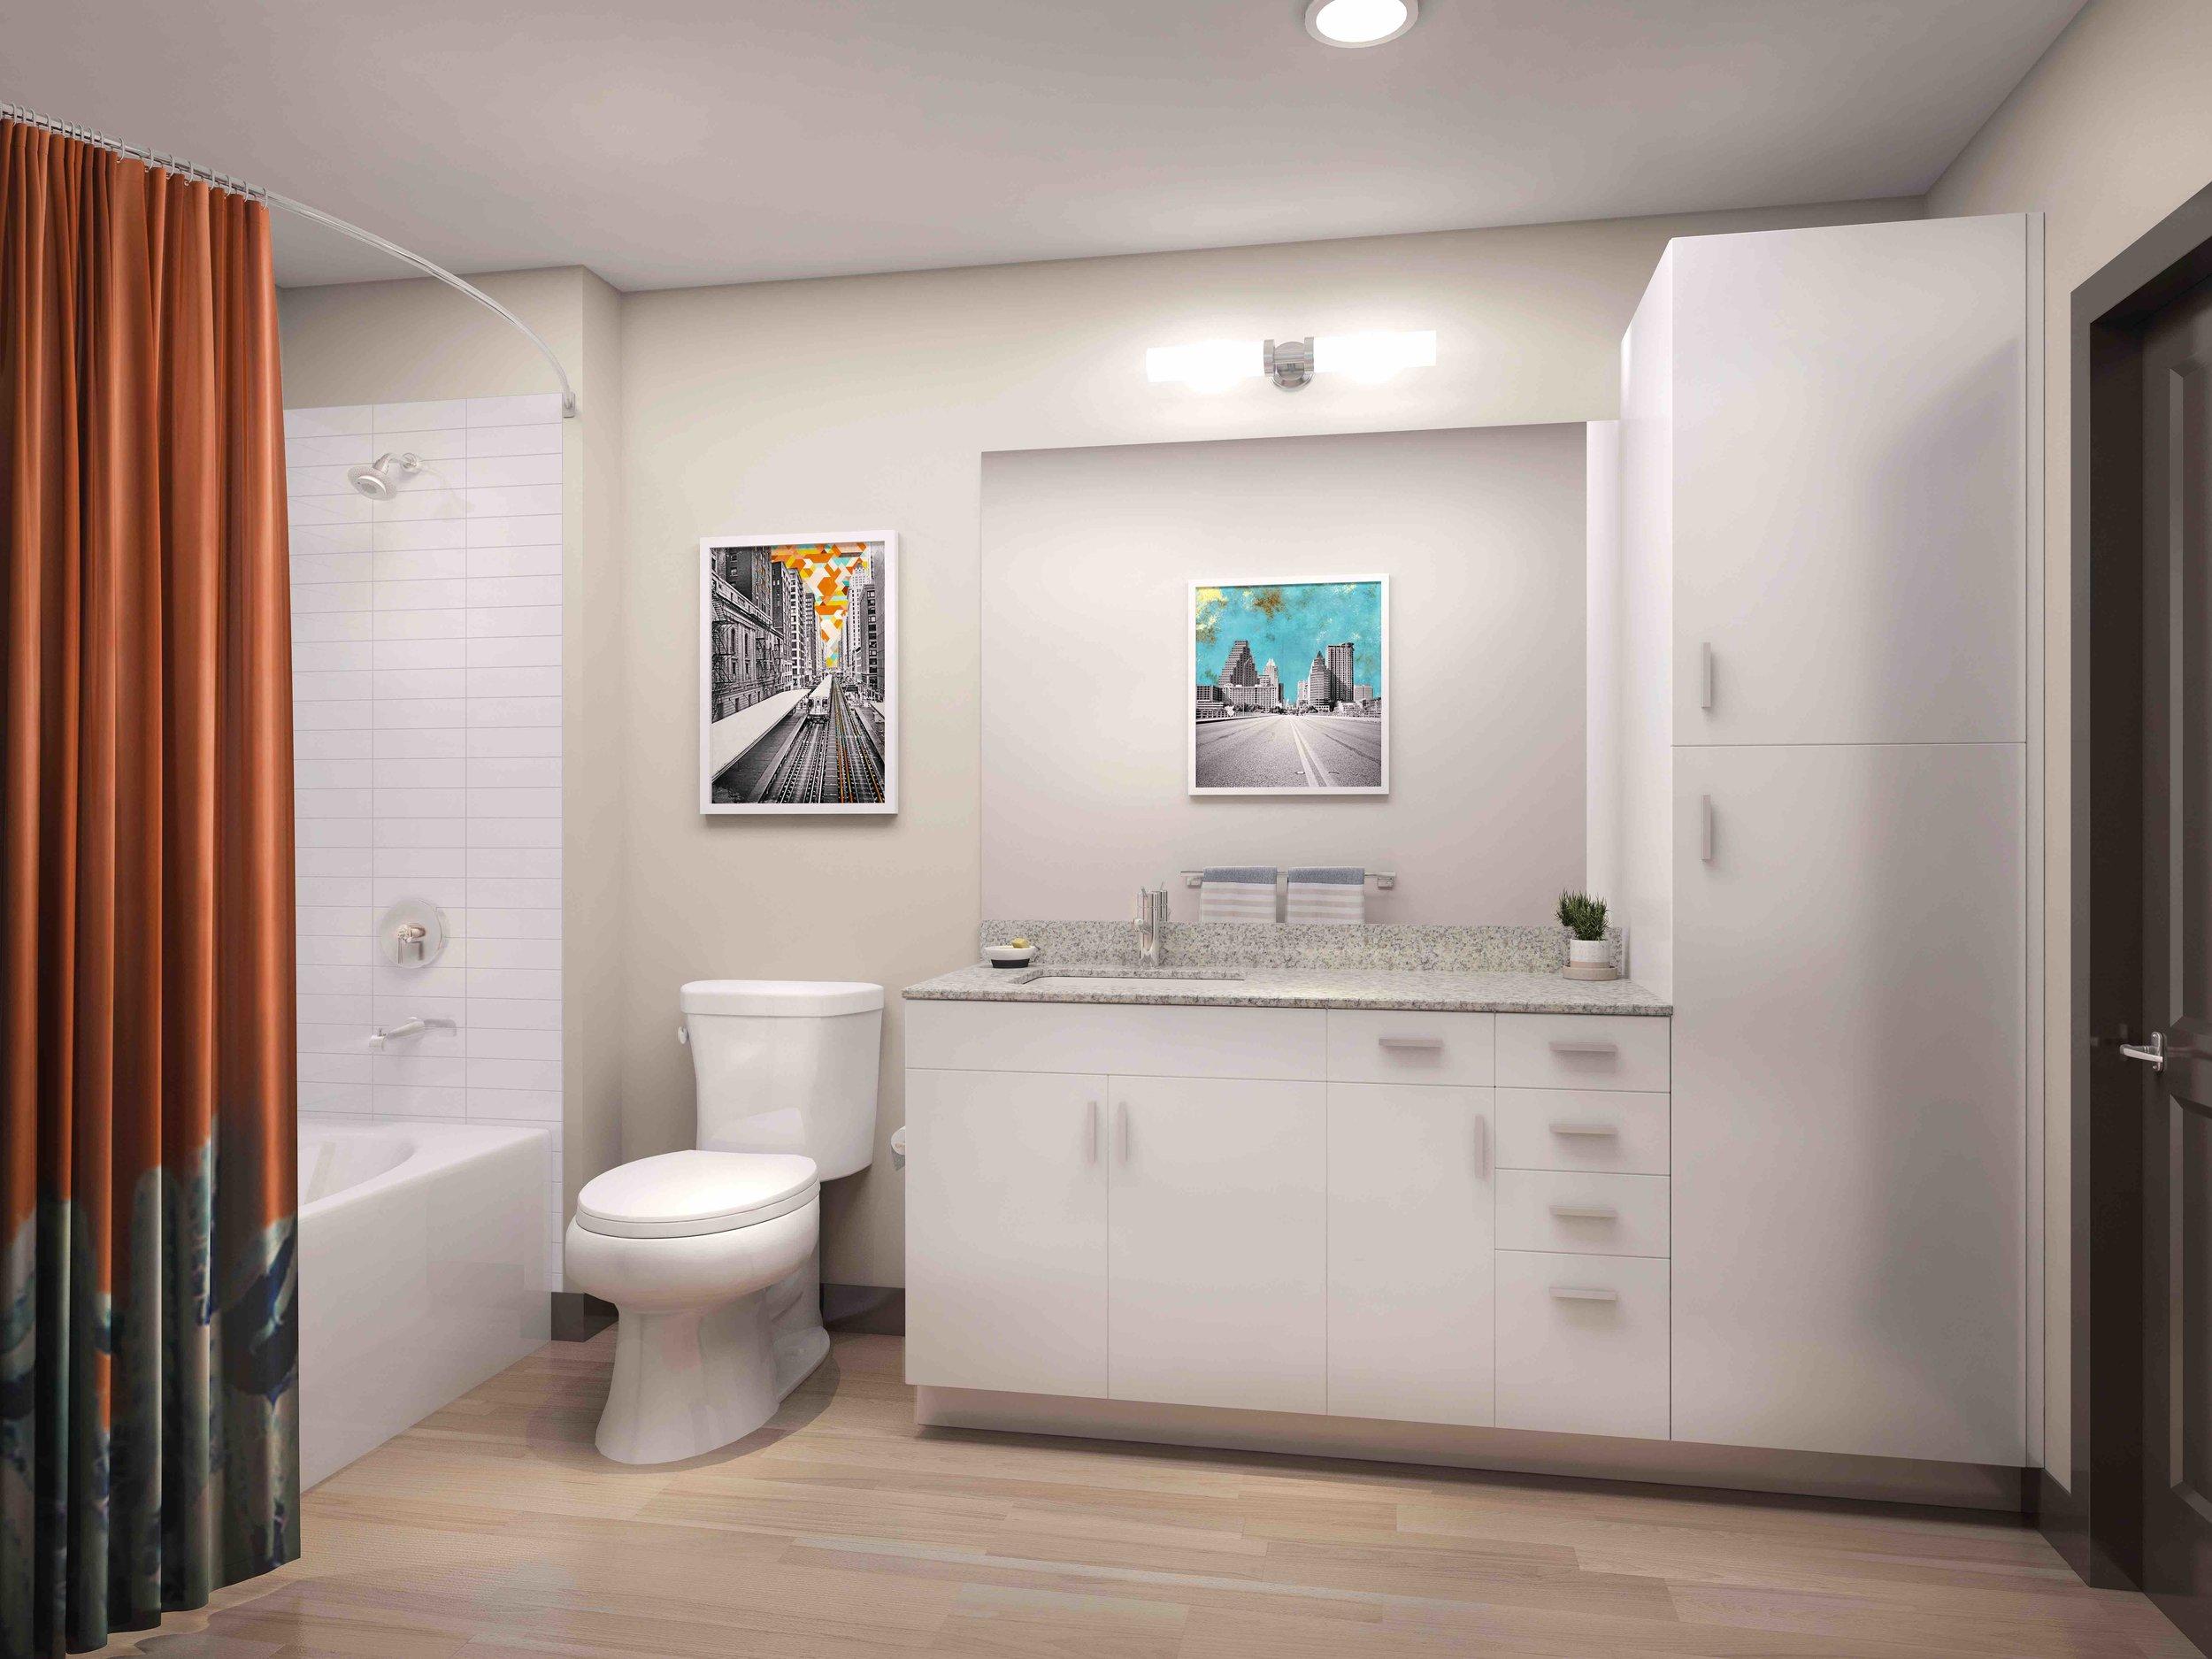 10 - Bathroom copy.jpg